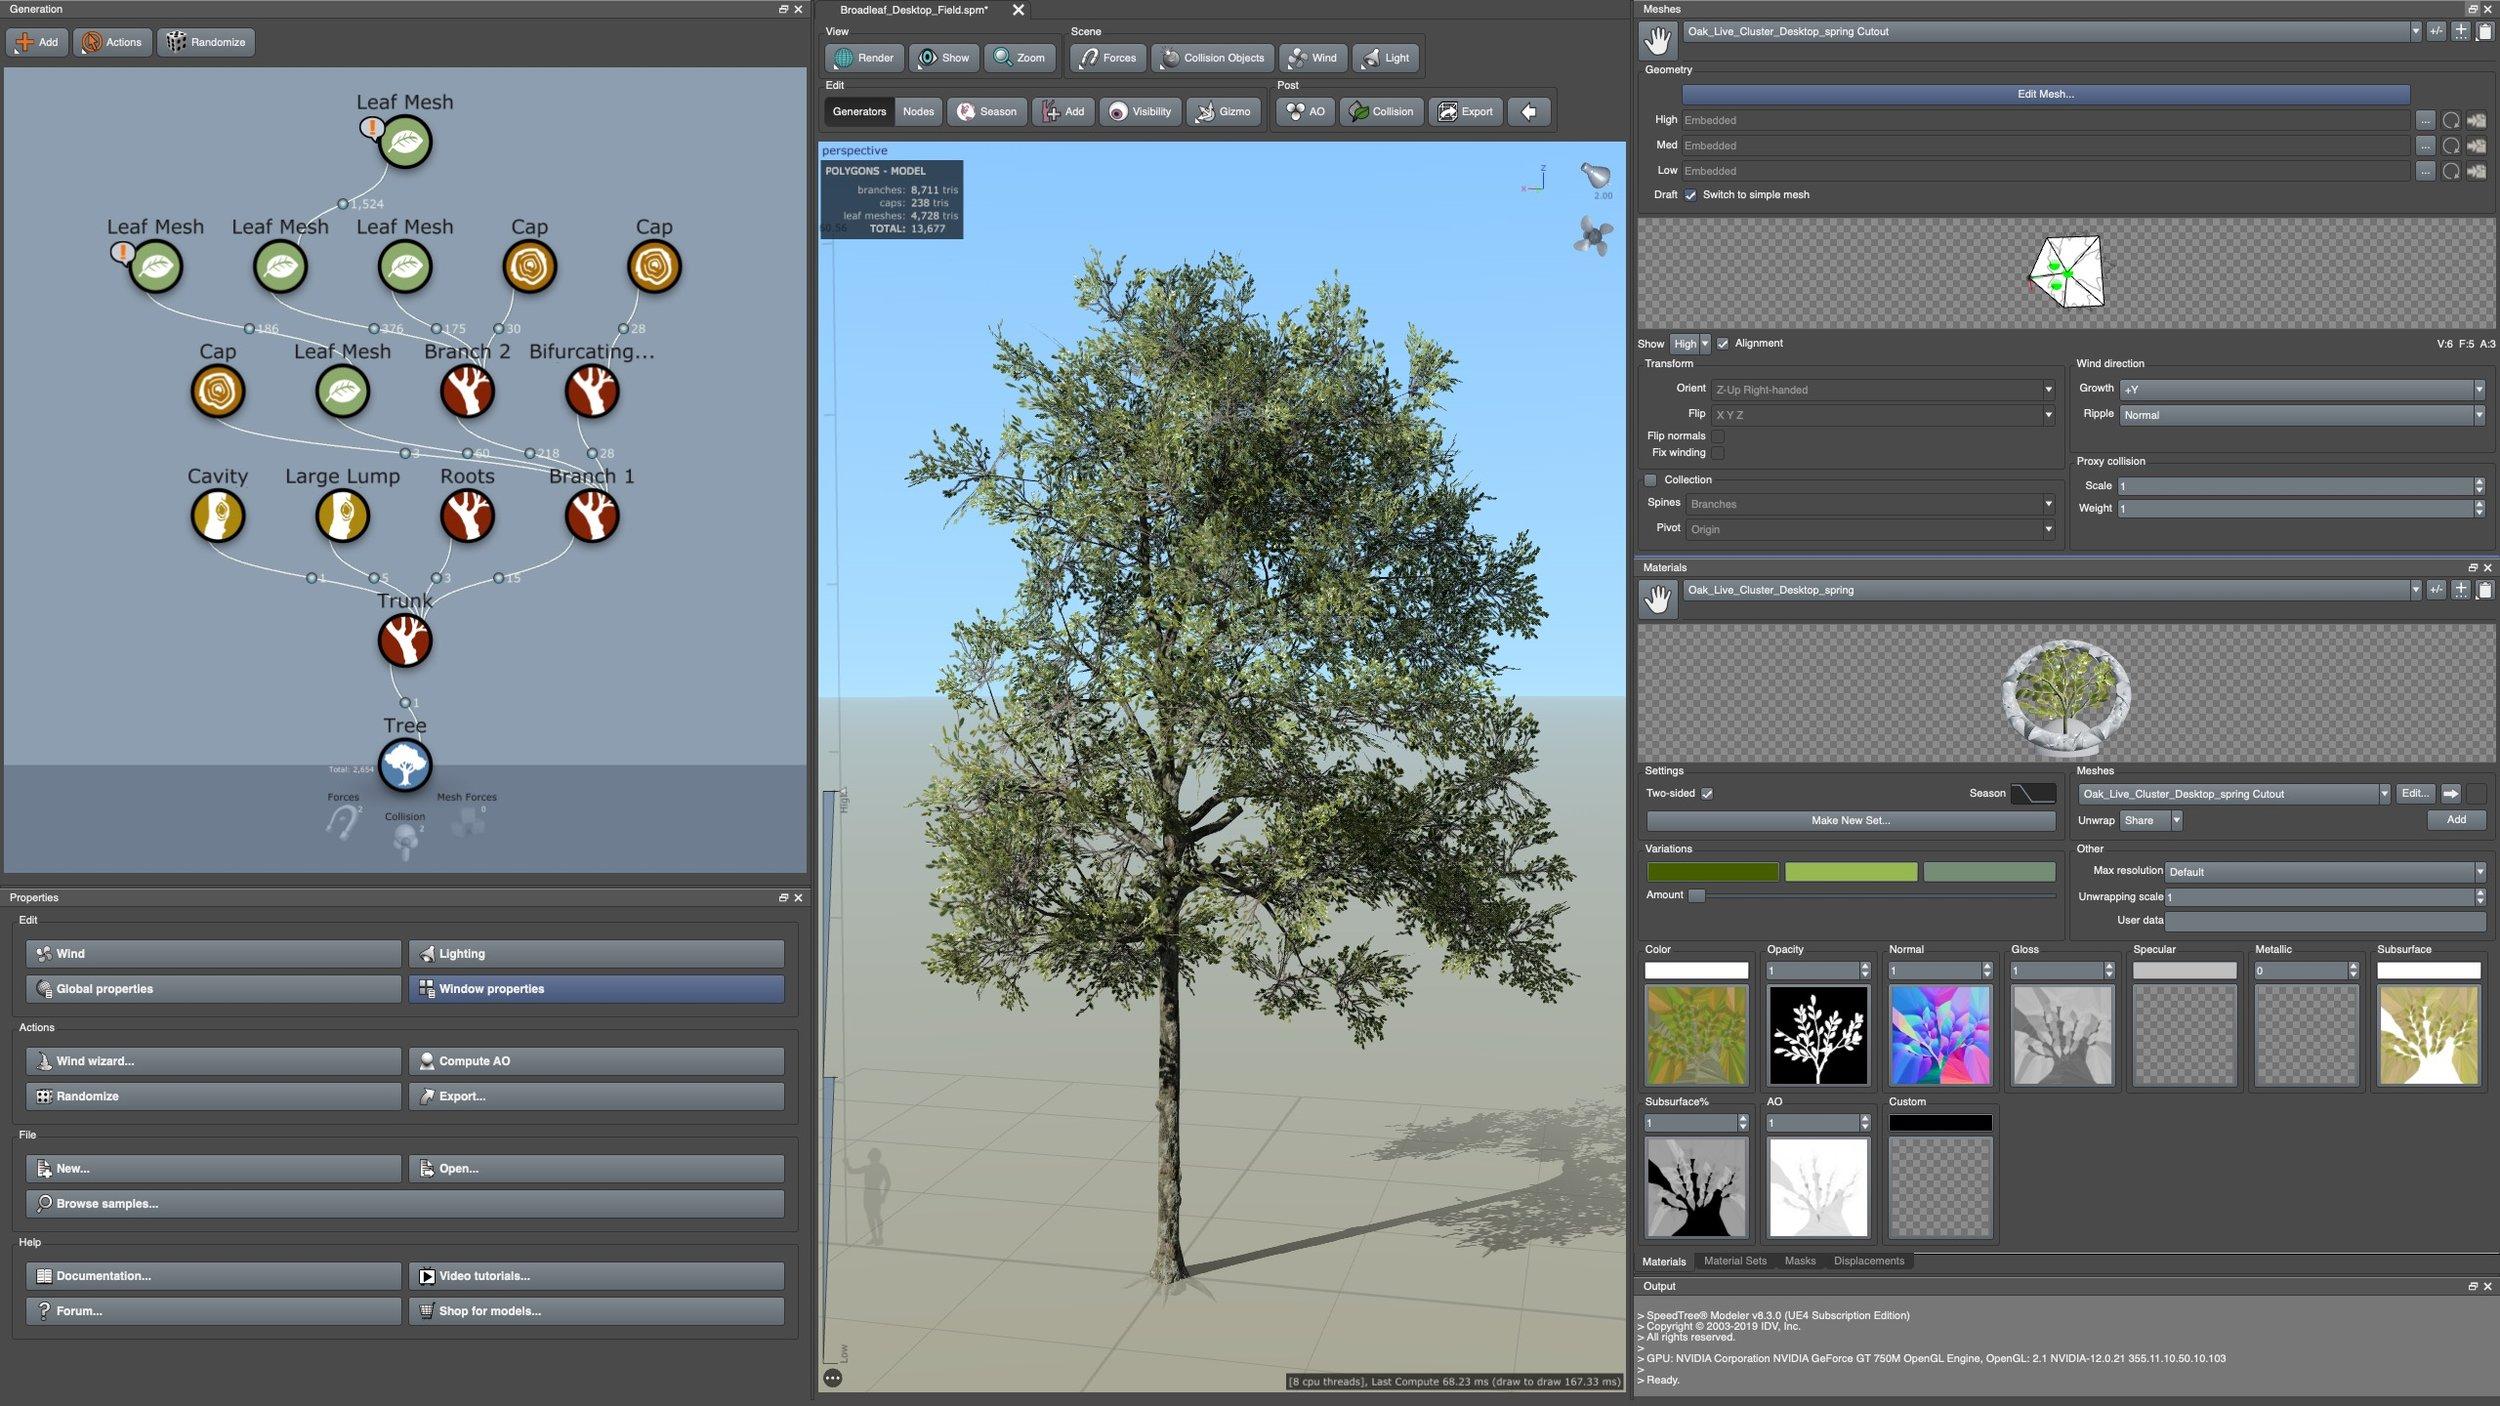 SpeedTree Vegetation Modeling Software